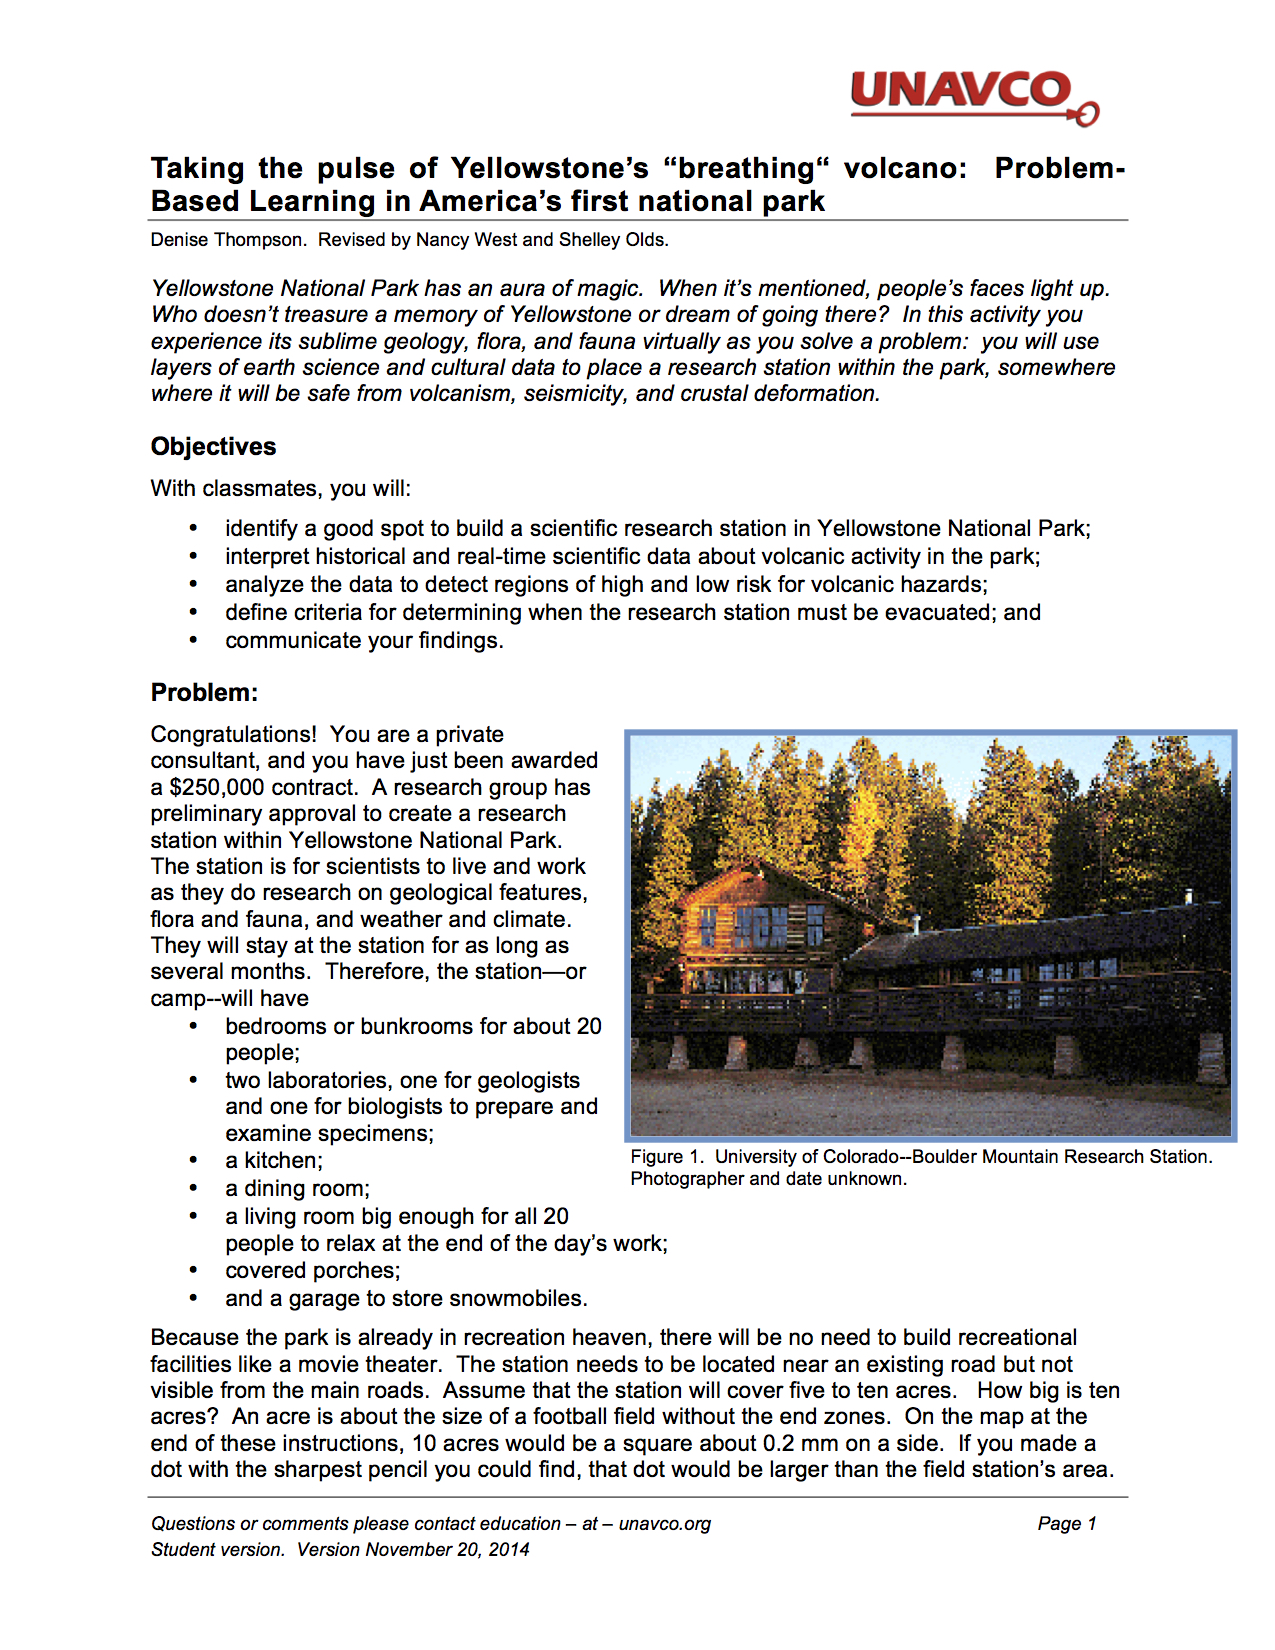 Unavco Yellowstone Activity Image